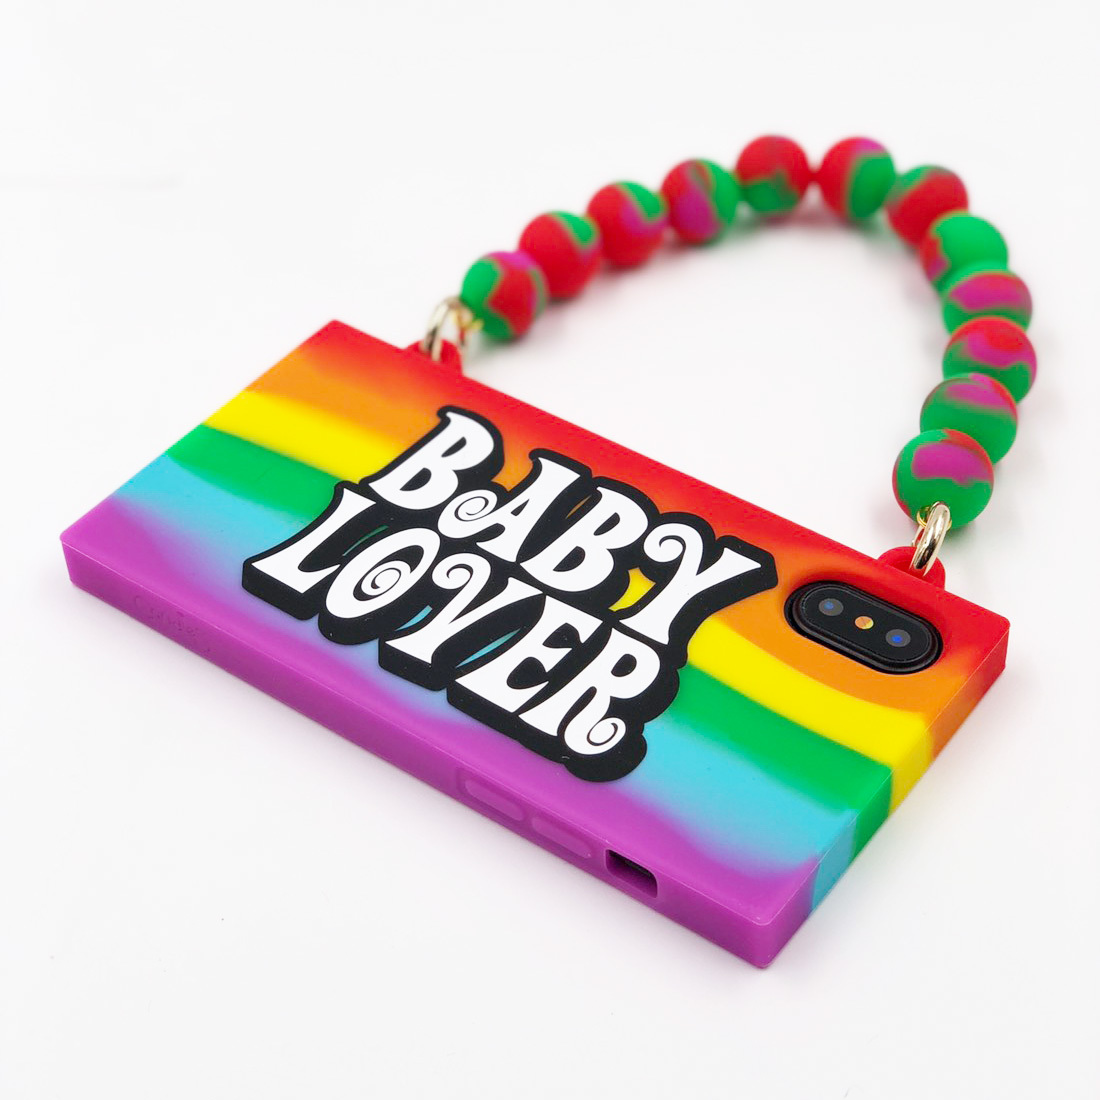 "RAINBOW HANDBAG CASE ""BABY LOVER"" for iPhoneXS/iPhoneX"